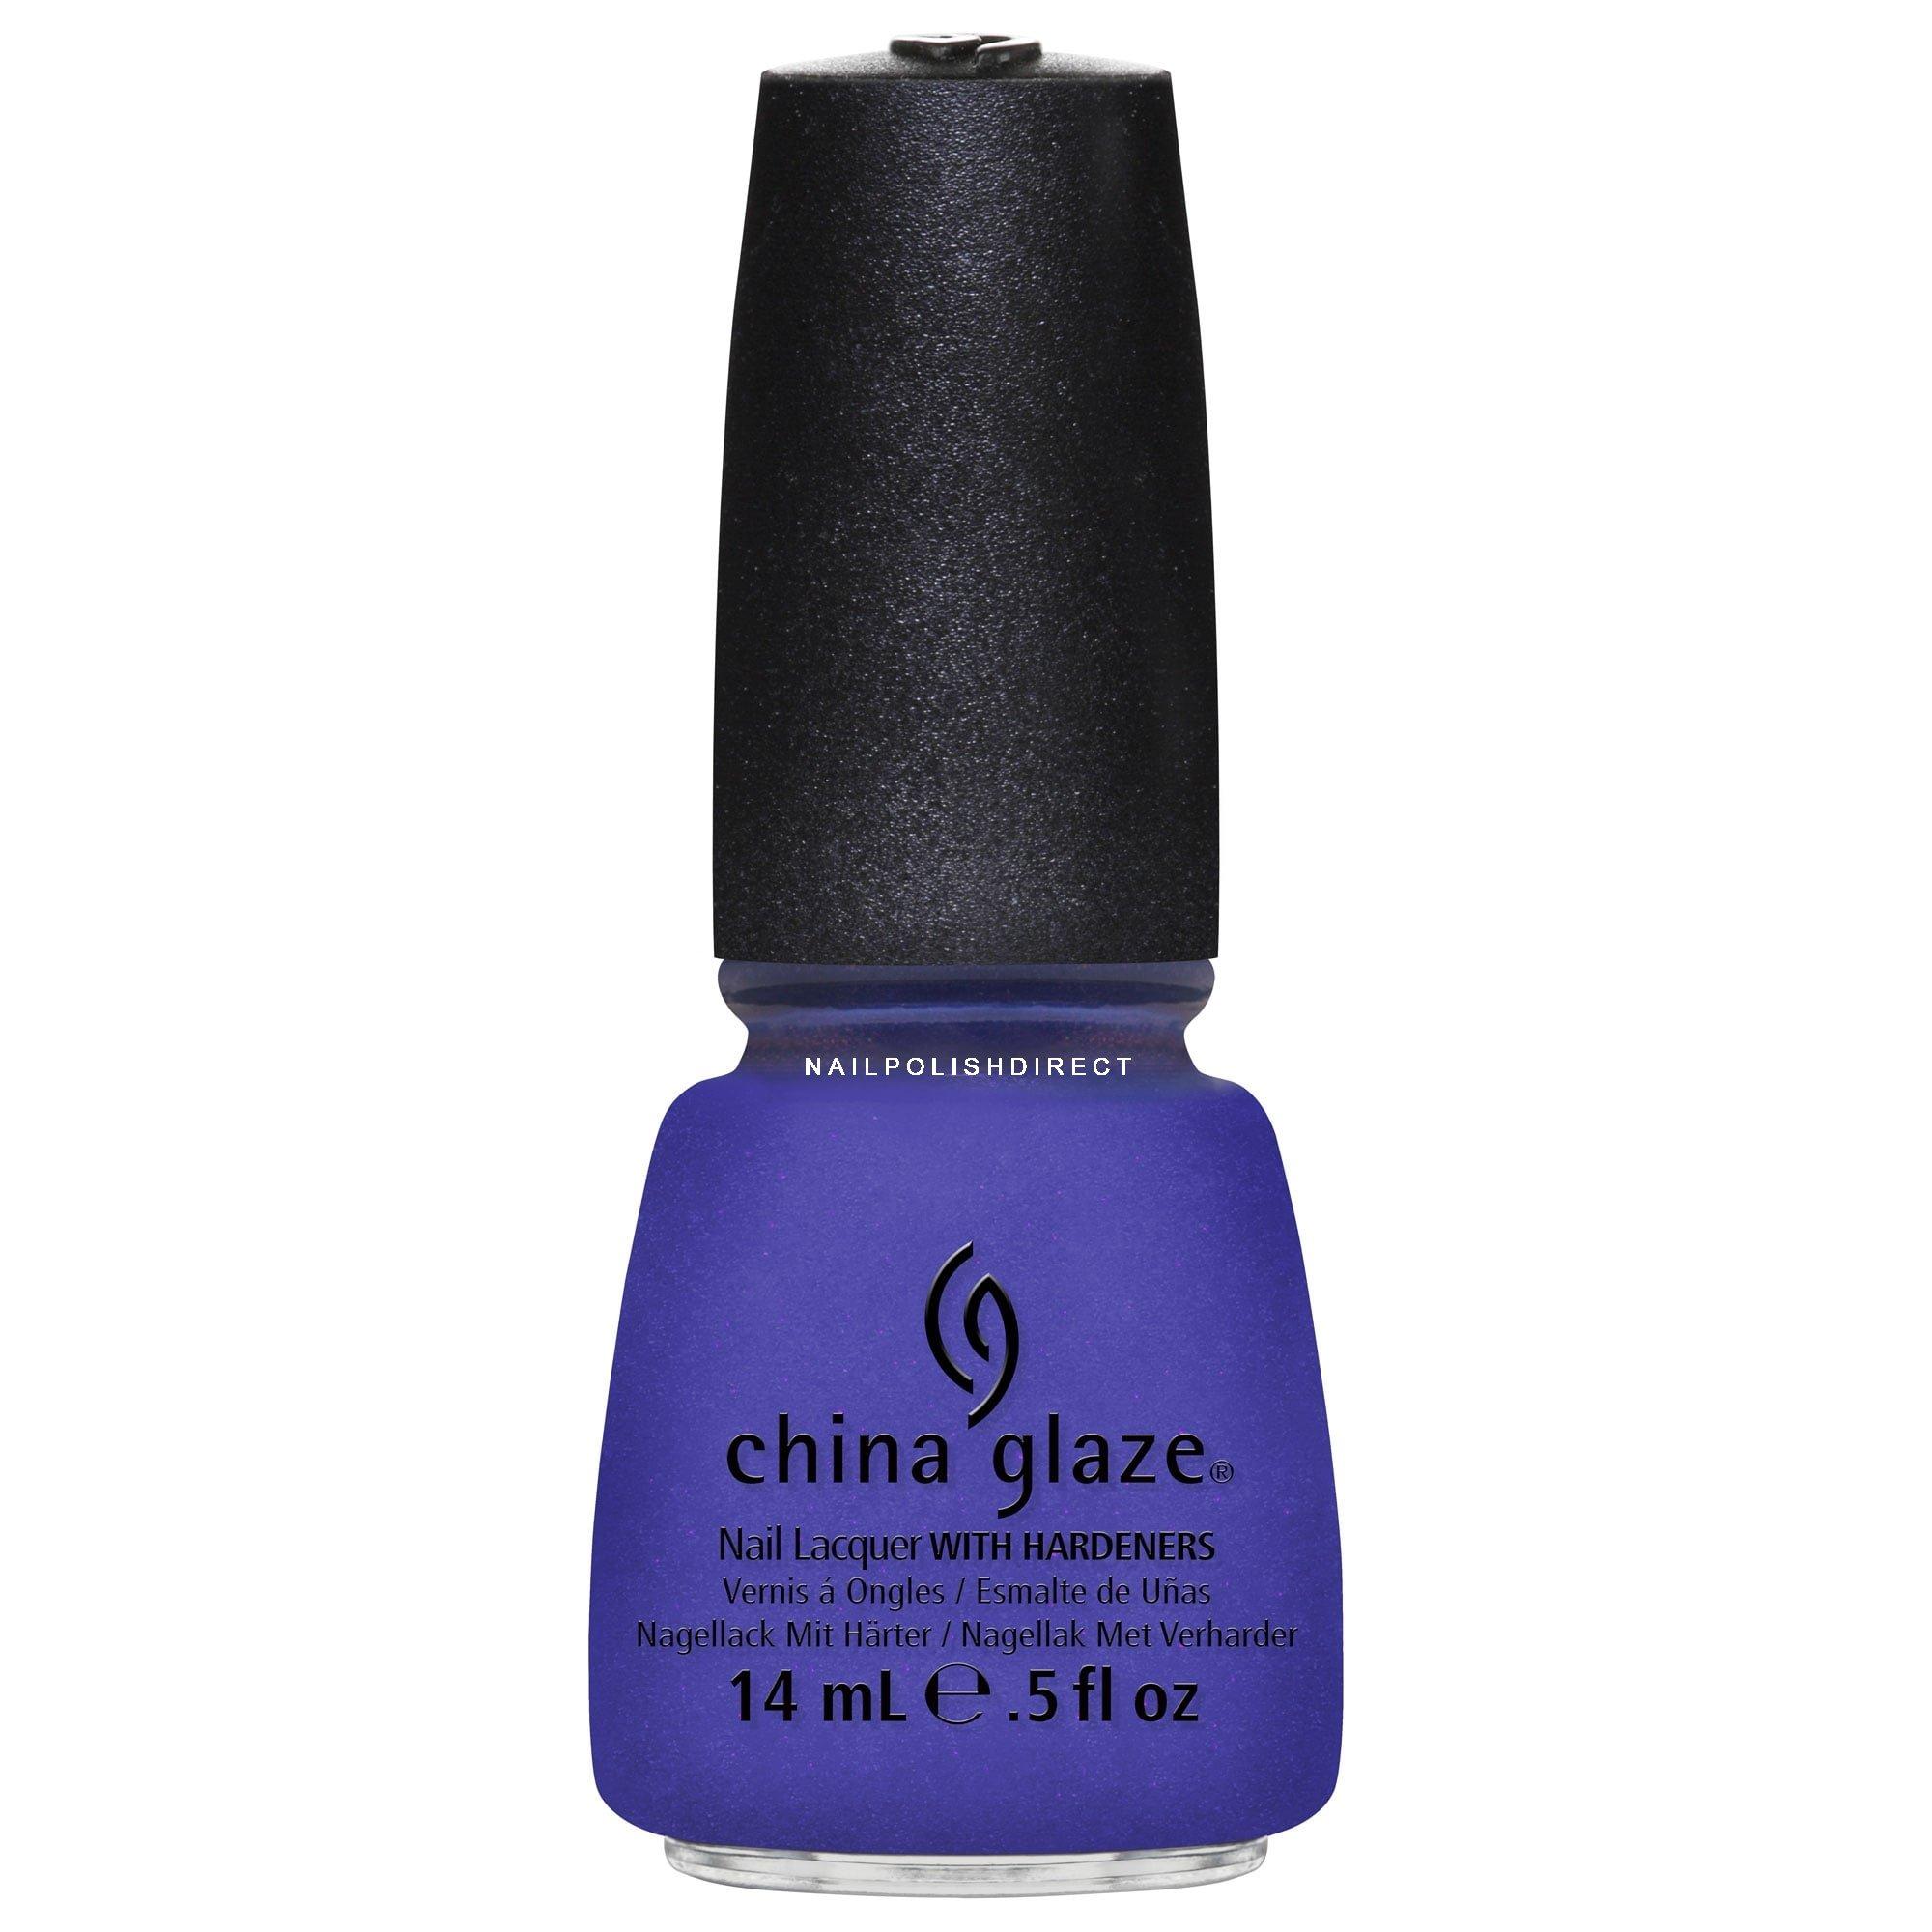 China Glaze Avant Garden Nail Polish Collection - Fancy Pants